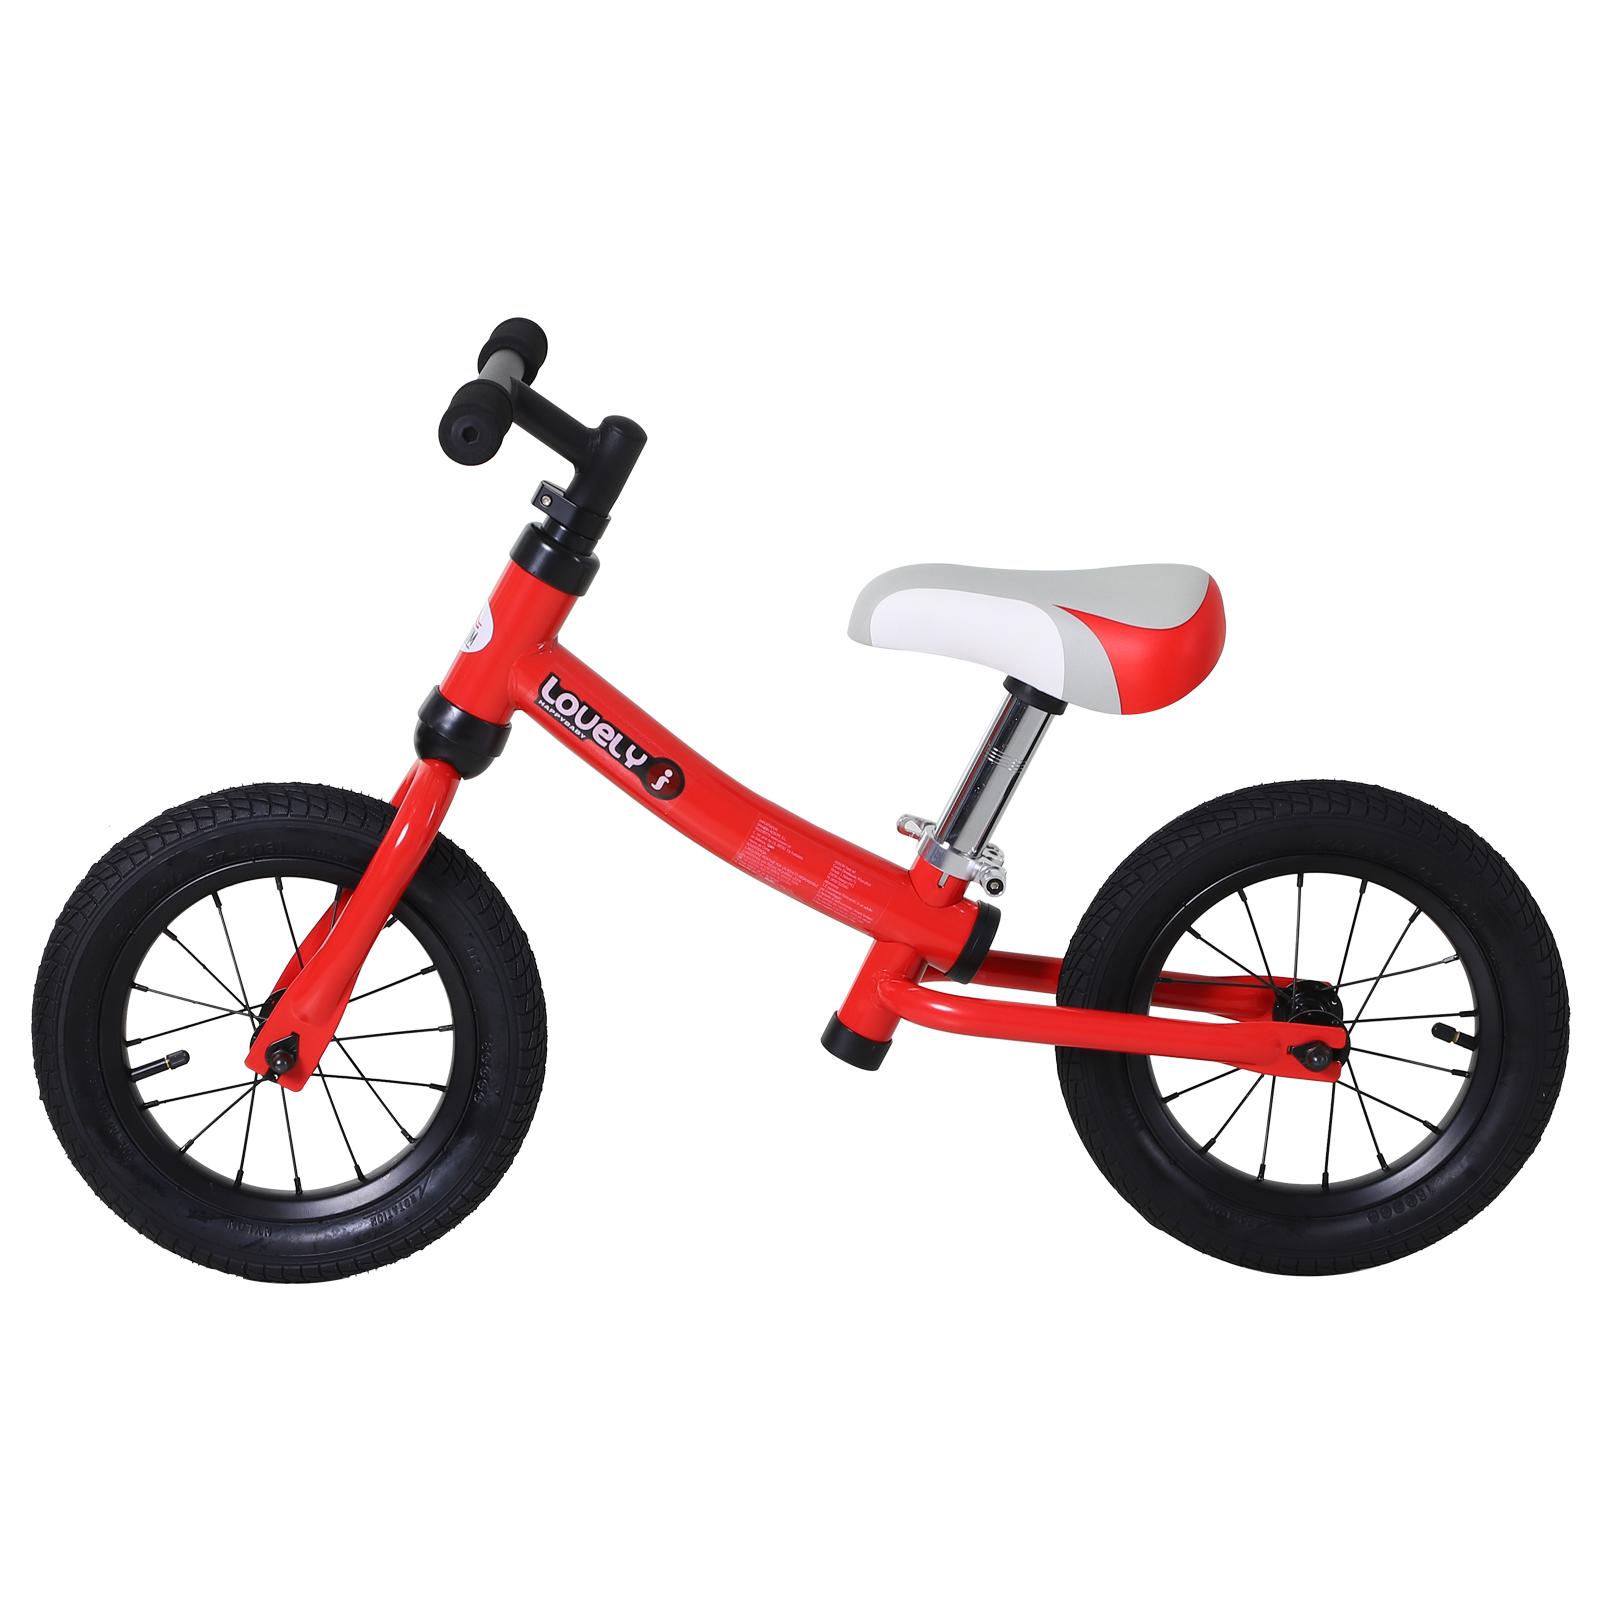 Bicicleta-sin-Pedales-de-Altura-de-Asiento-Regulable-31-45cm-2-5-Anos miniatura 22